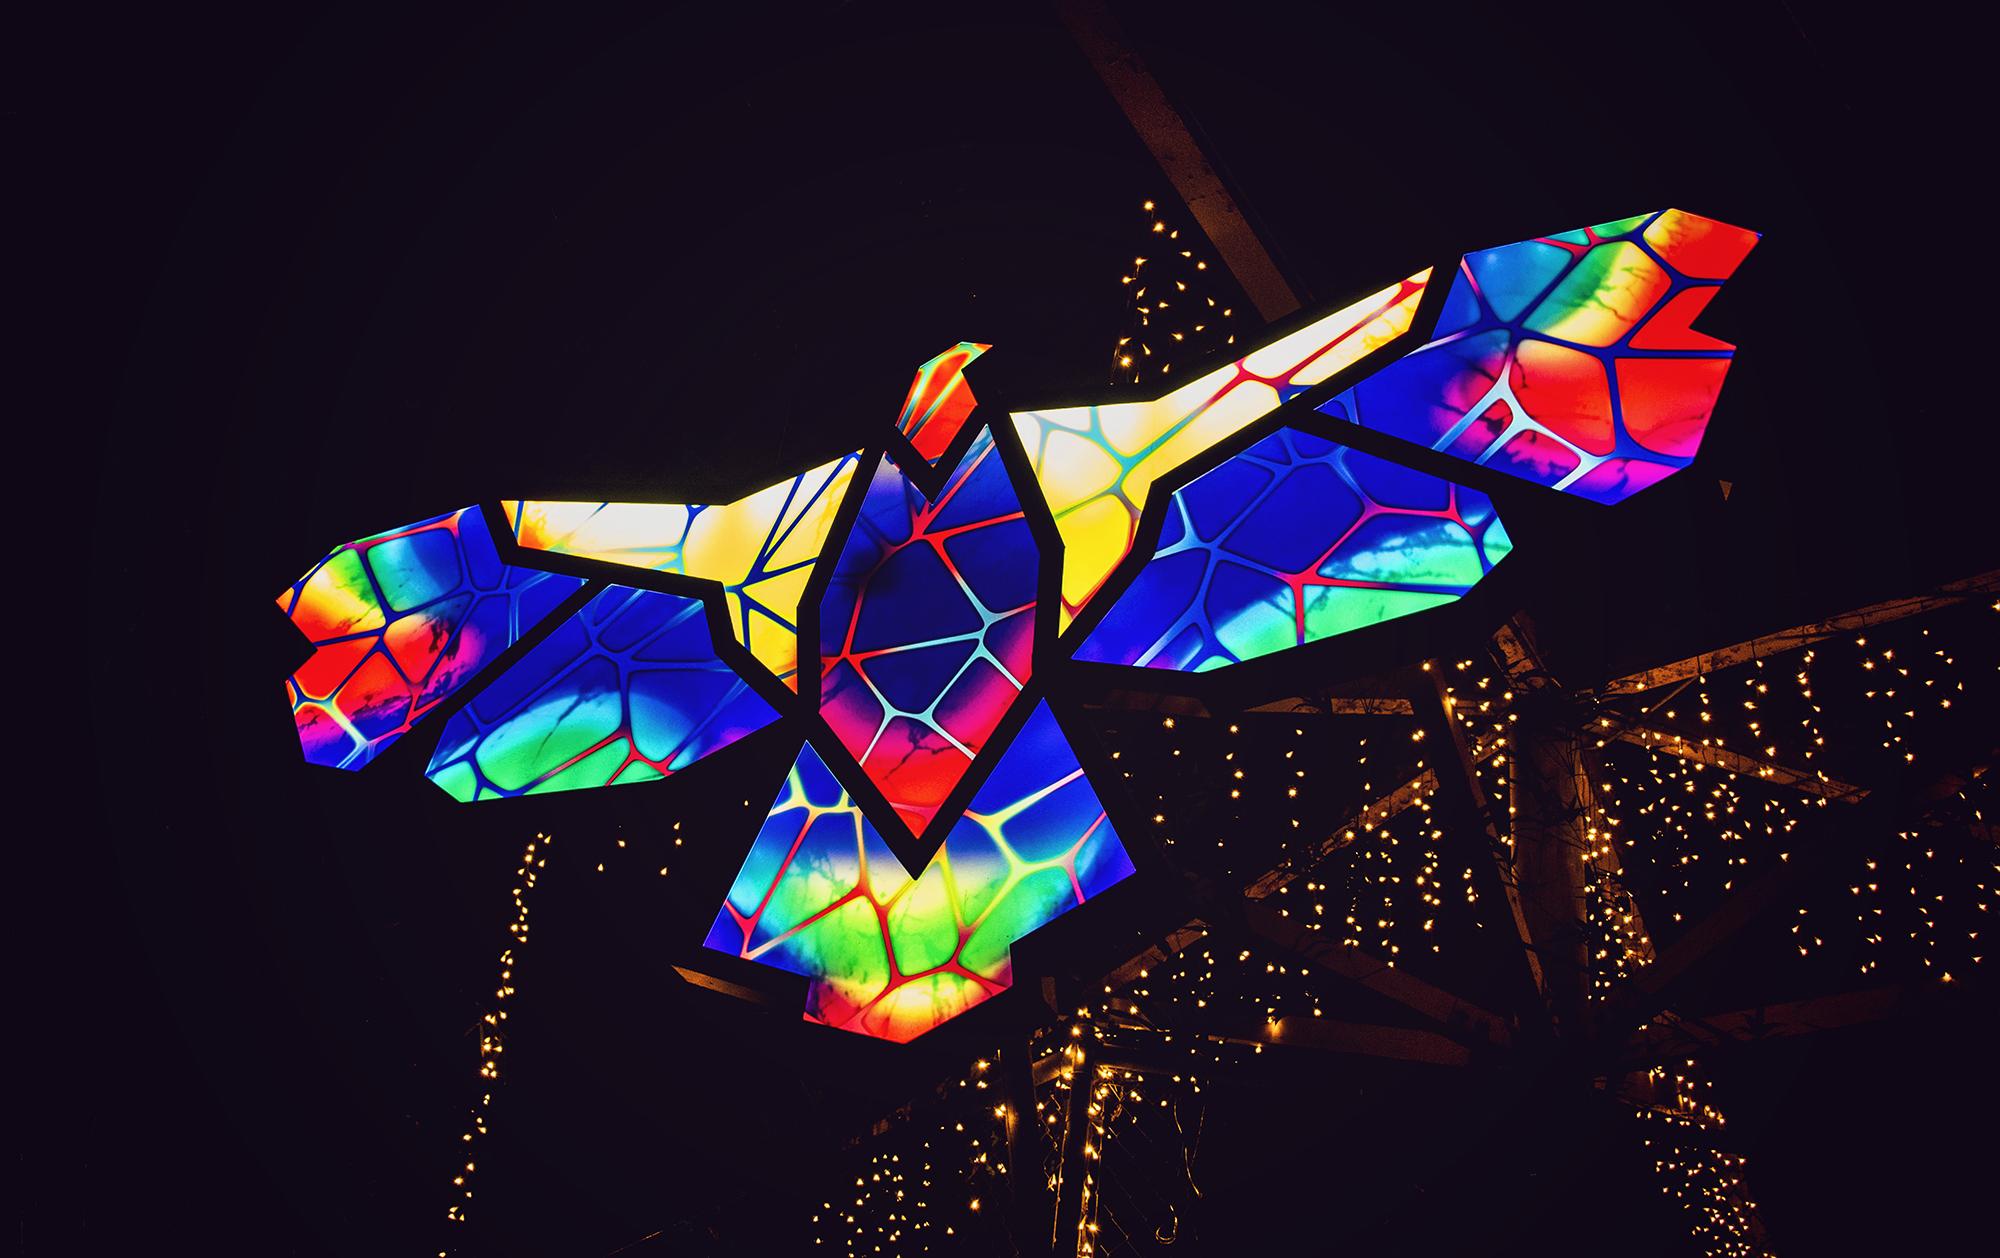 zoolights1_8low.jpg